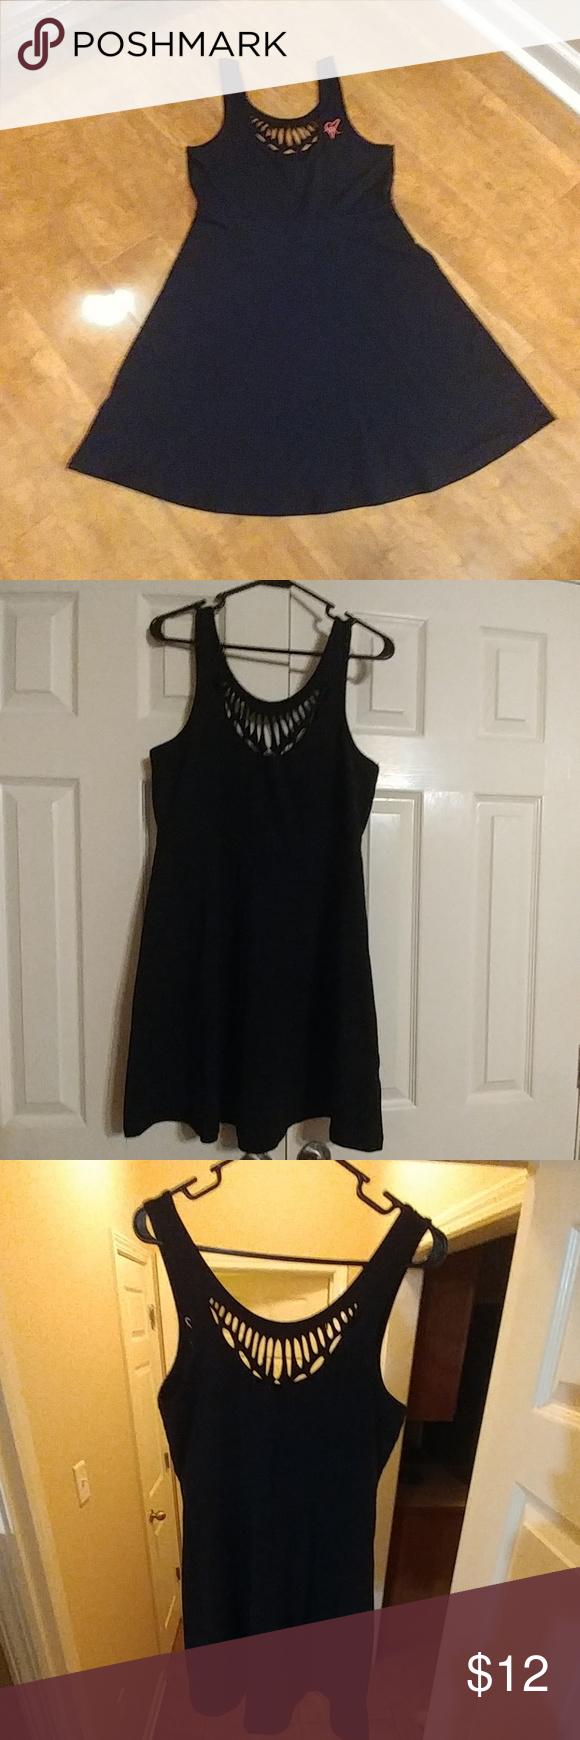 Sale sexy black dress black cottonpolyester blend tank dress with